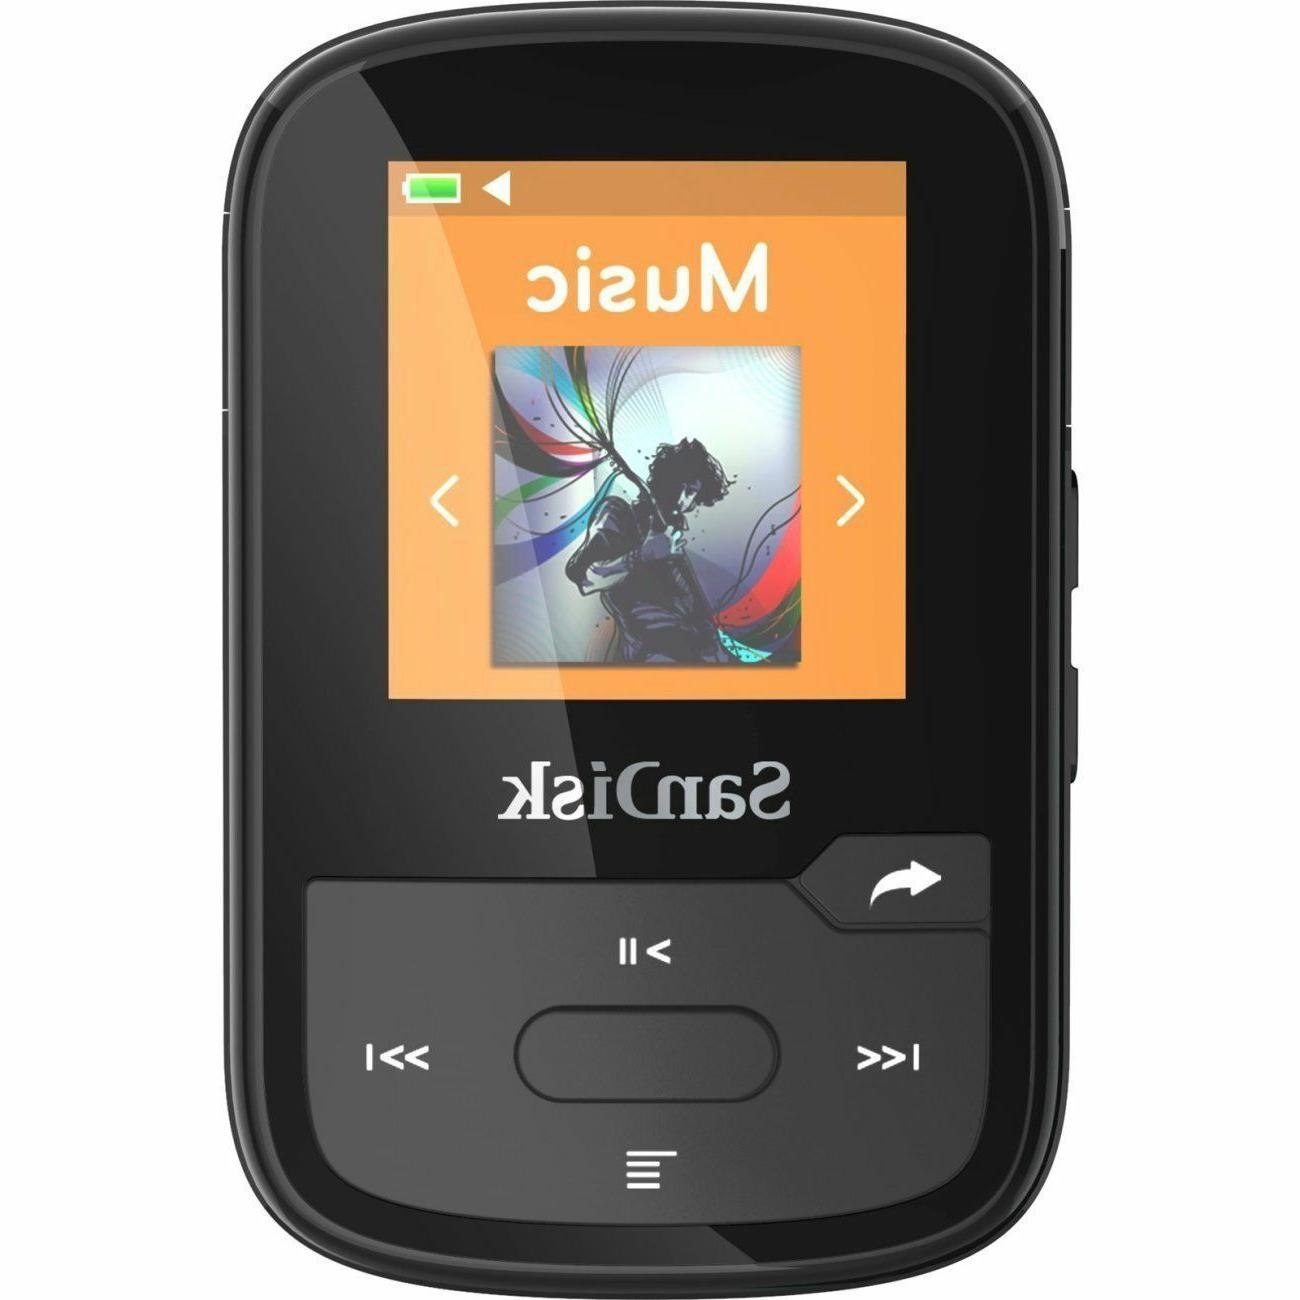 SanDisk SDMX28-016G-A46K ClipSport MP3 Player - Black